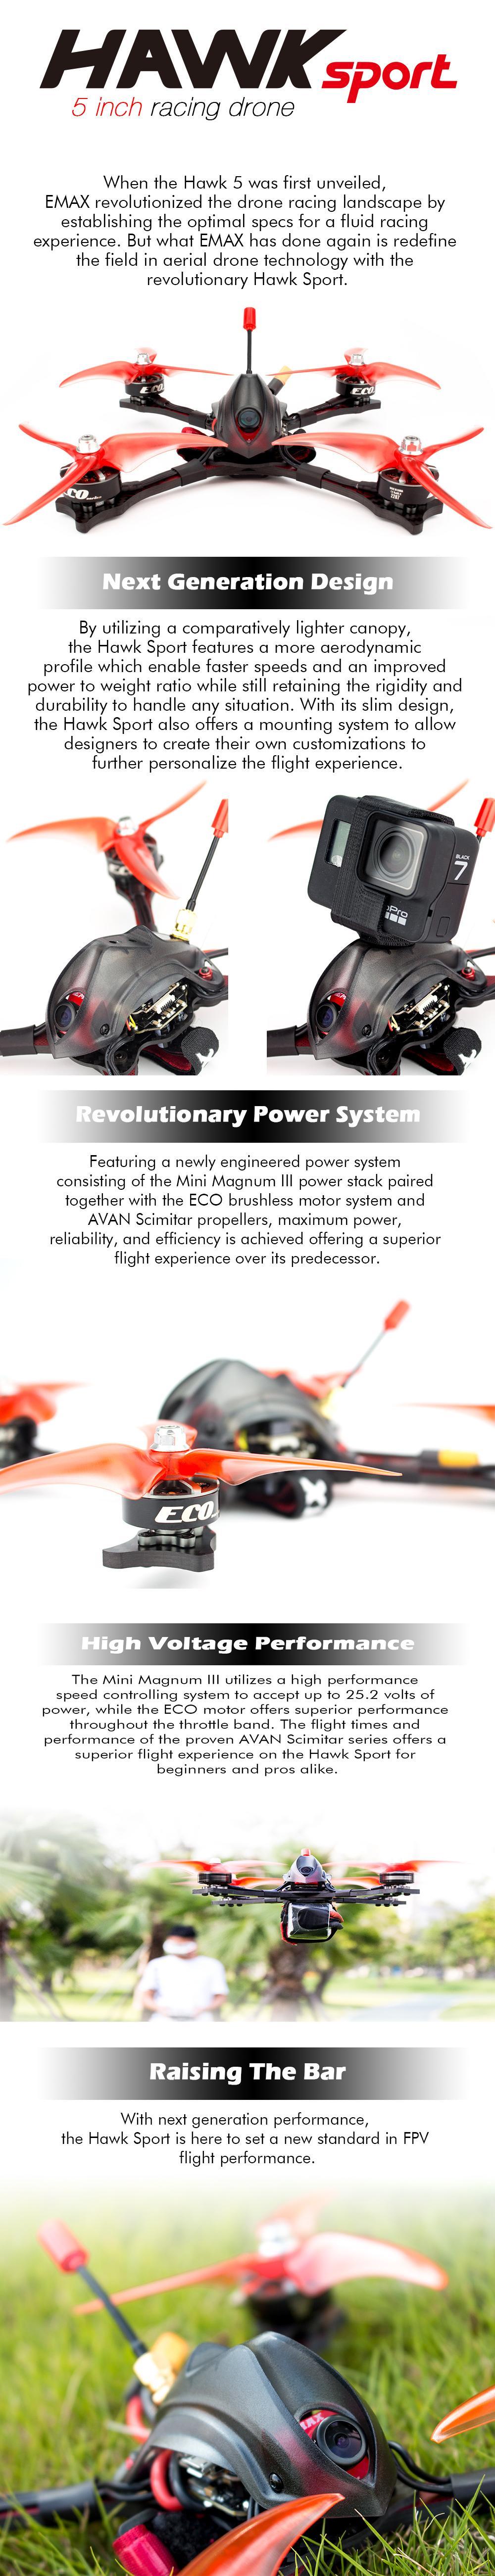 "EMAX Hawk Sport 5"" BNF Brushless FPV Drone 1700KV 2400KV"